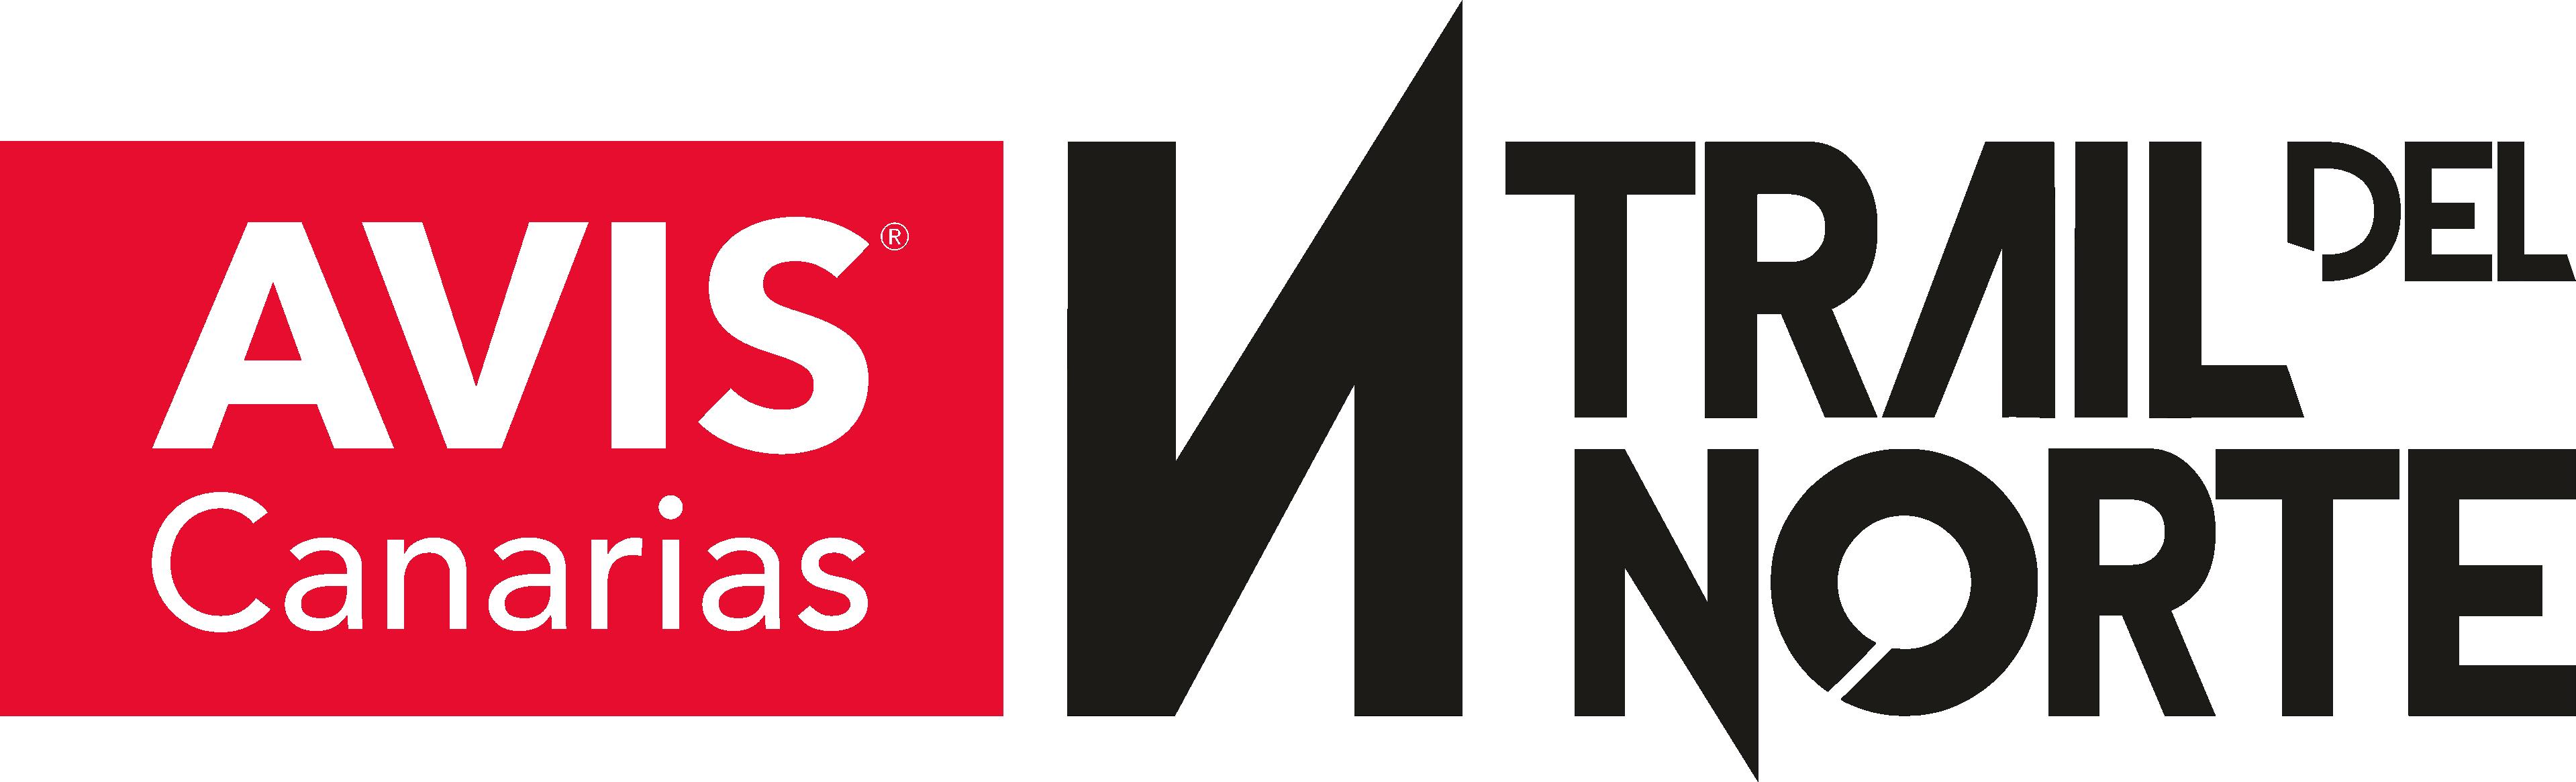 logo-AVIS-trail-de-norte-2018-6